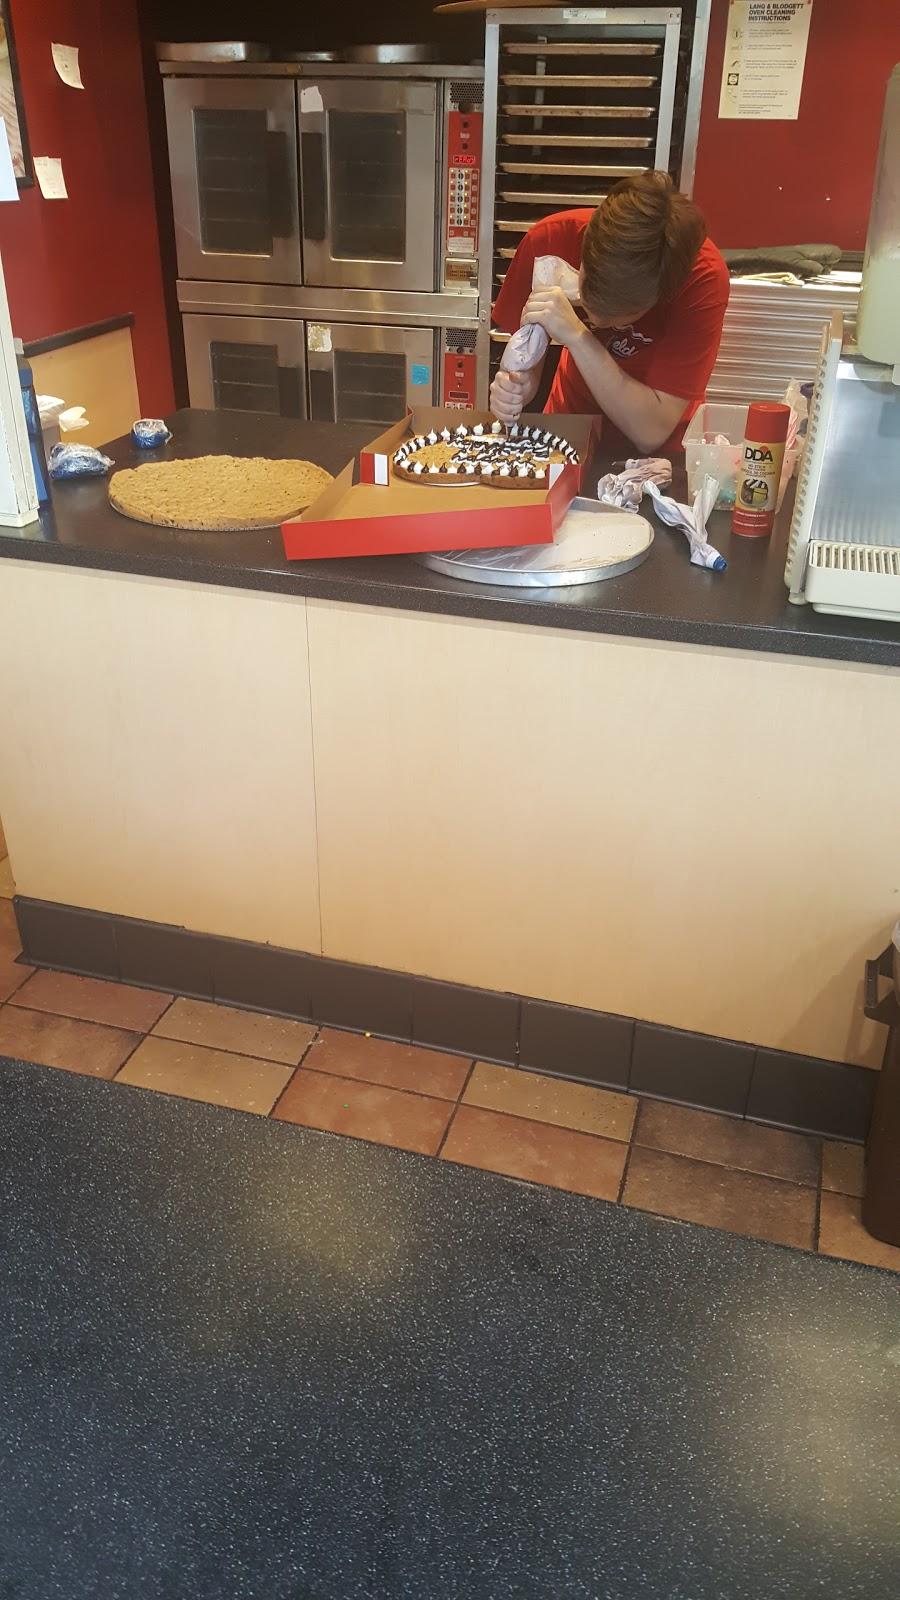 Mrs. Fields - bakery  | Photo 3 of 6 | Address: 2800 N Main St #672, Santa Ana, CA 92705, USA | Phone: (714) 972-1128